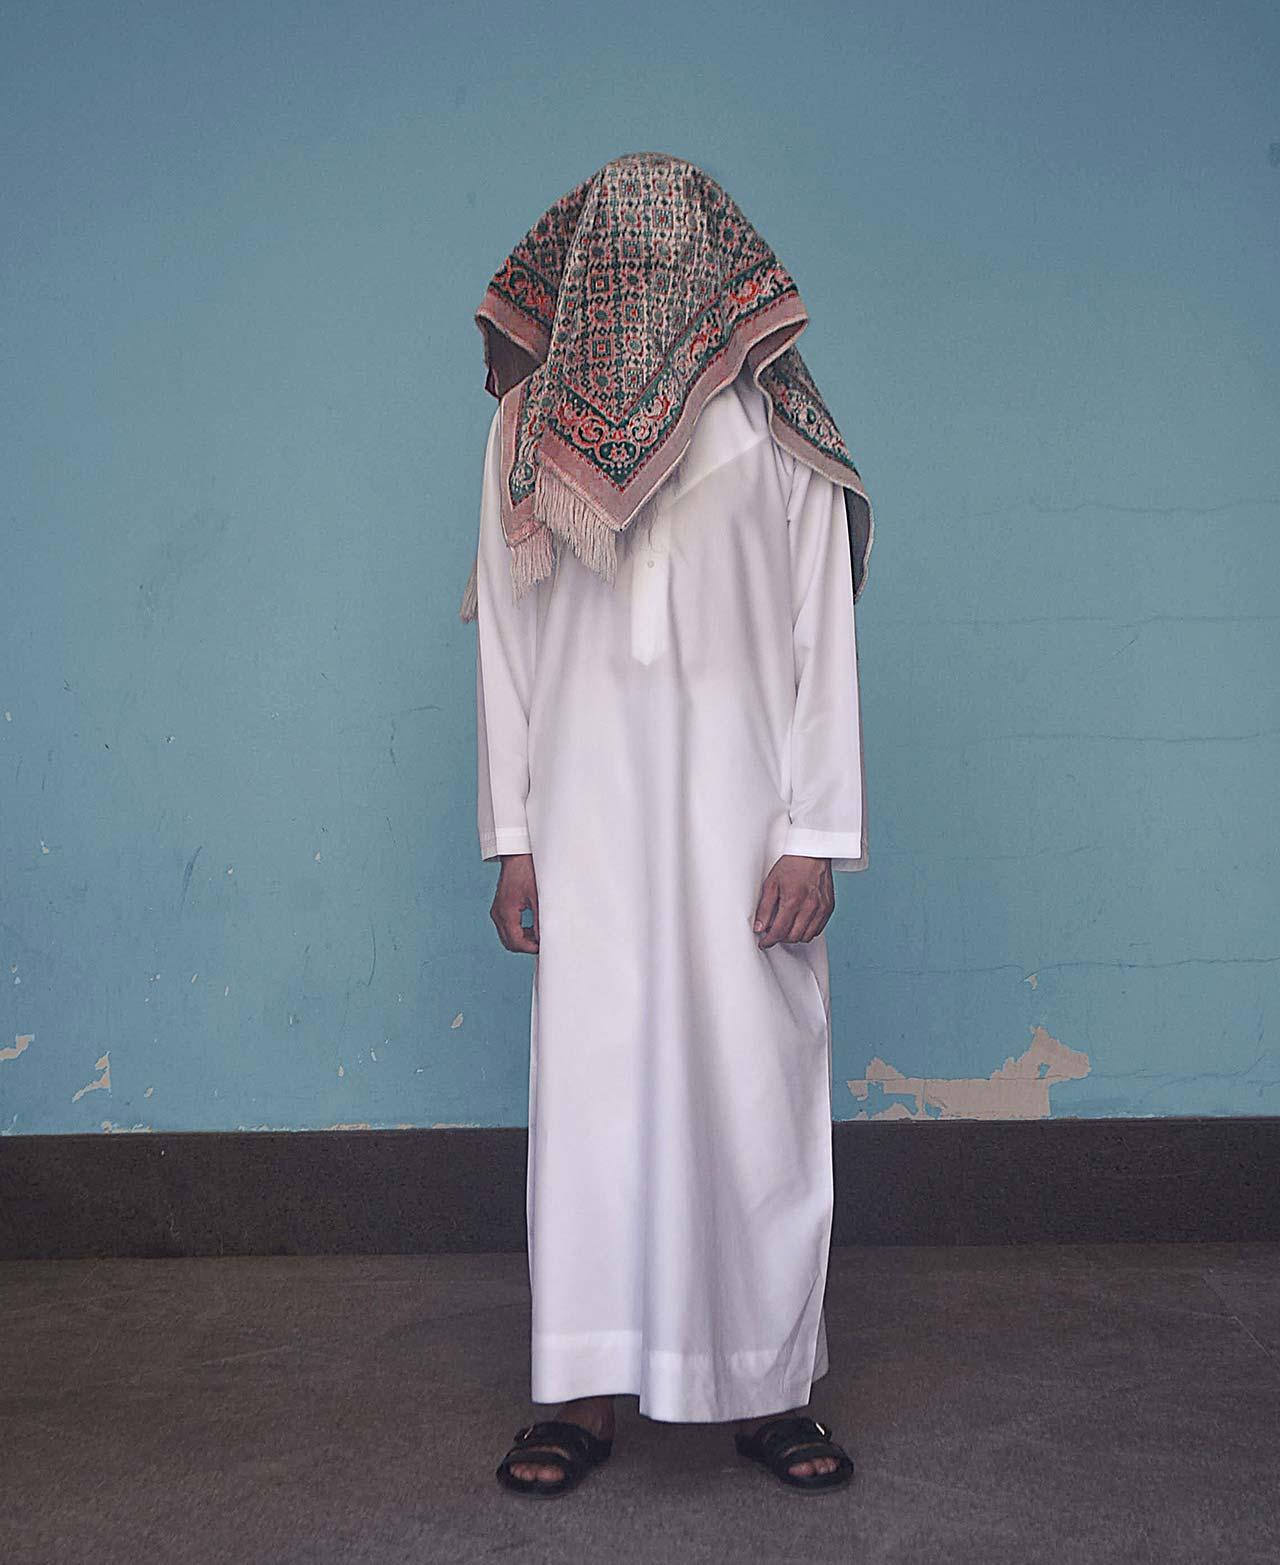 Ali Cha'aban